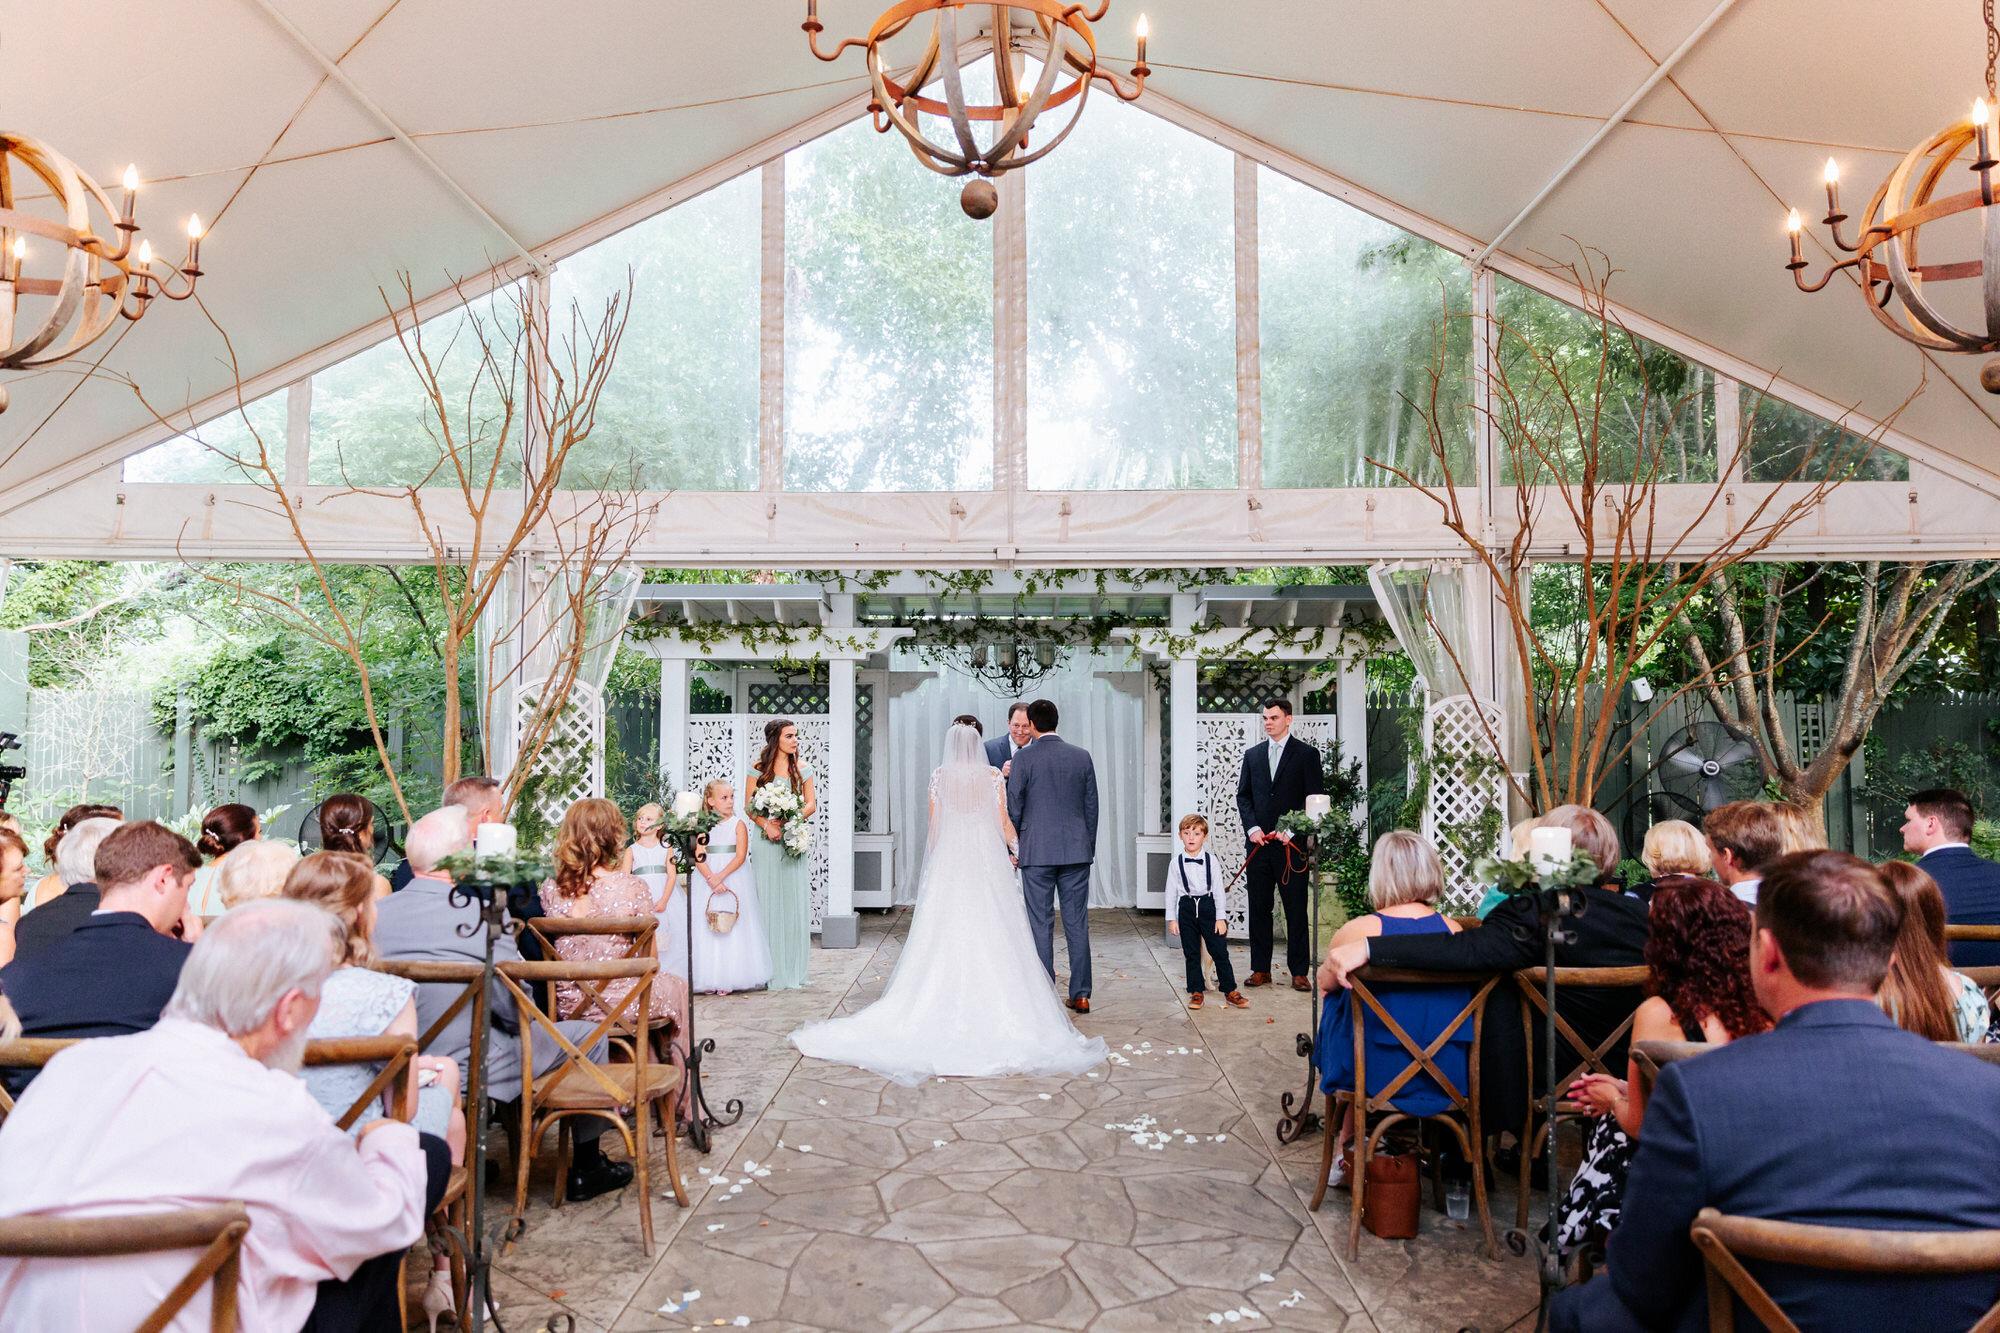 twigs-tempietto-wedding-greenville-downtown-346.JPG